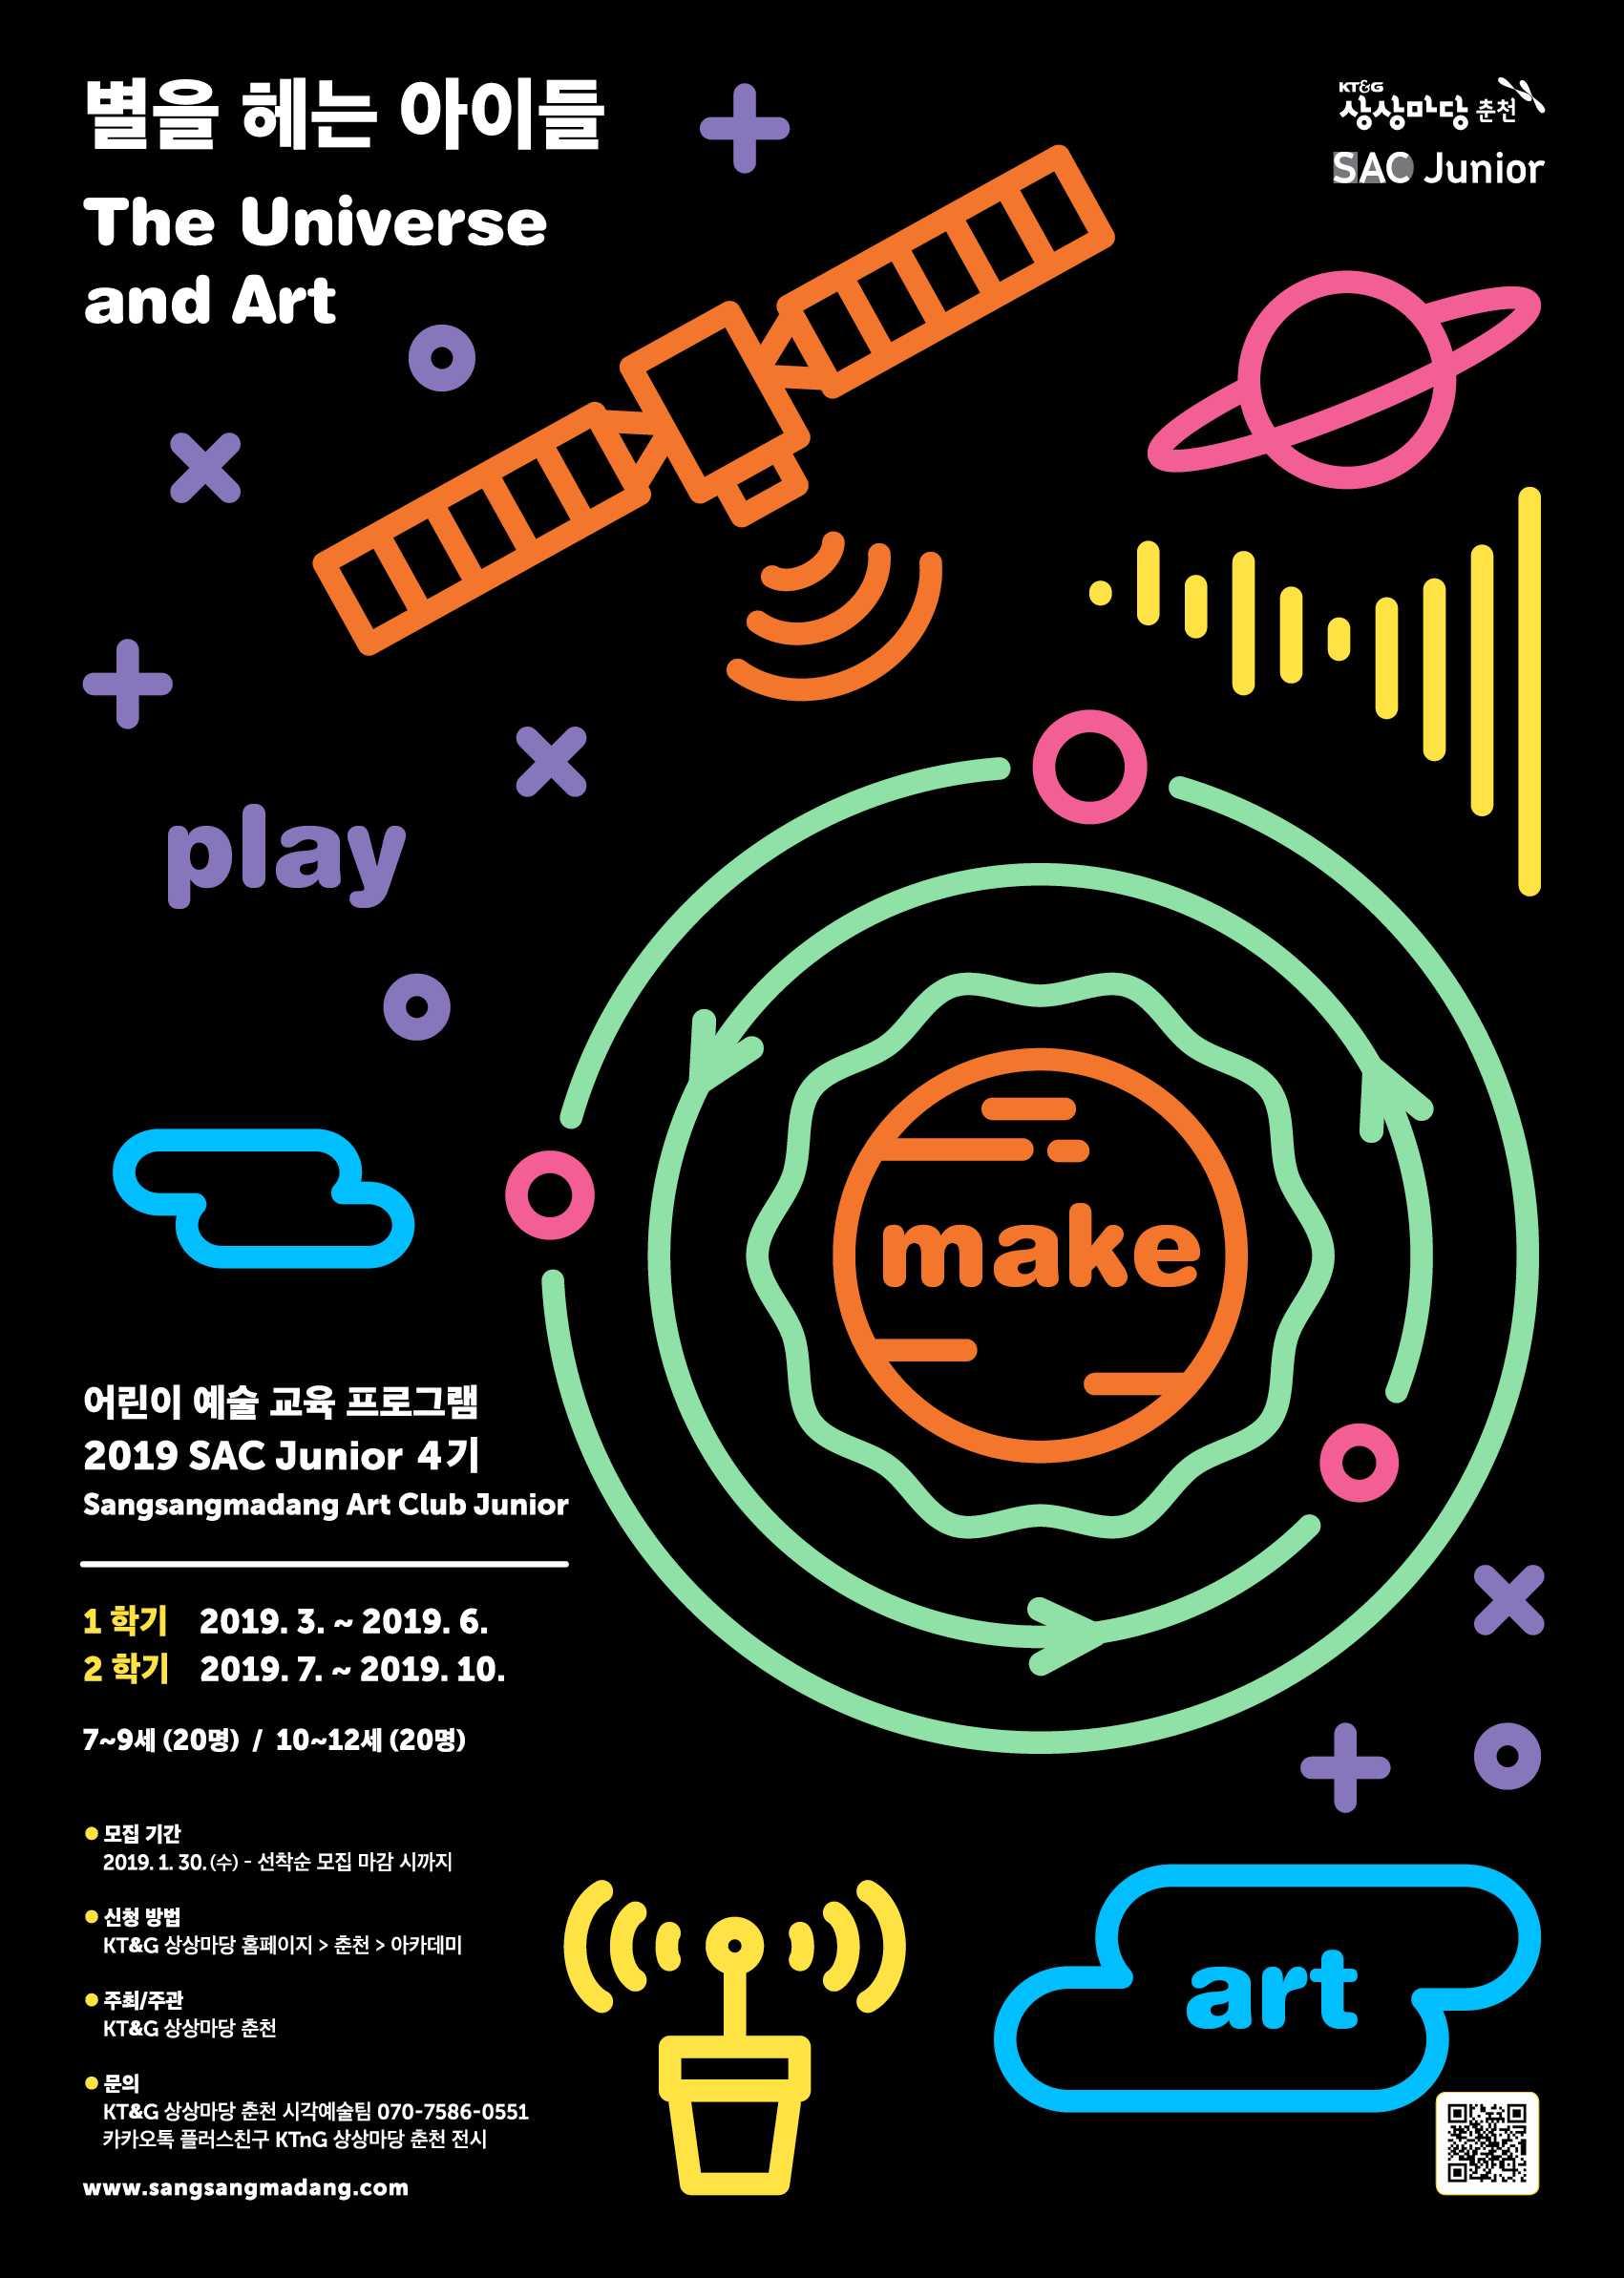 2019 <SAC Junior> 4기_2학기 (10-12세)